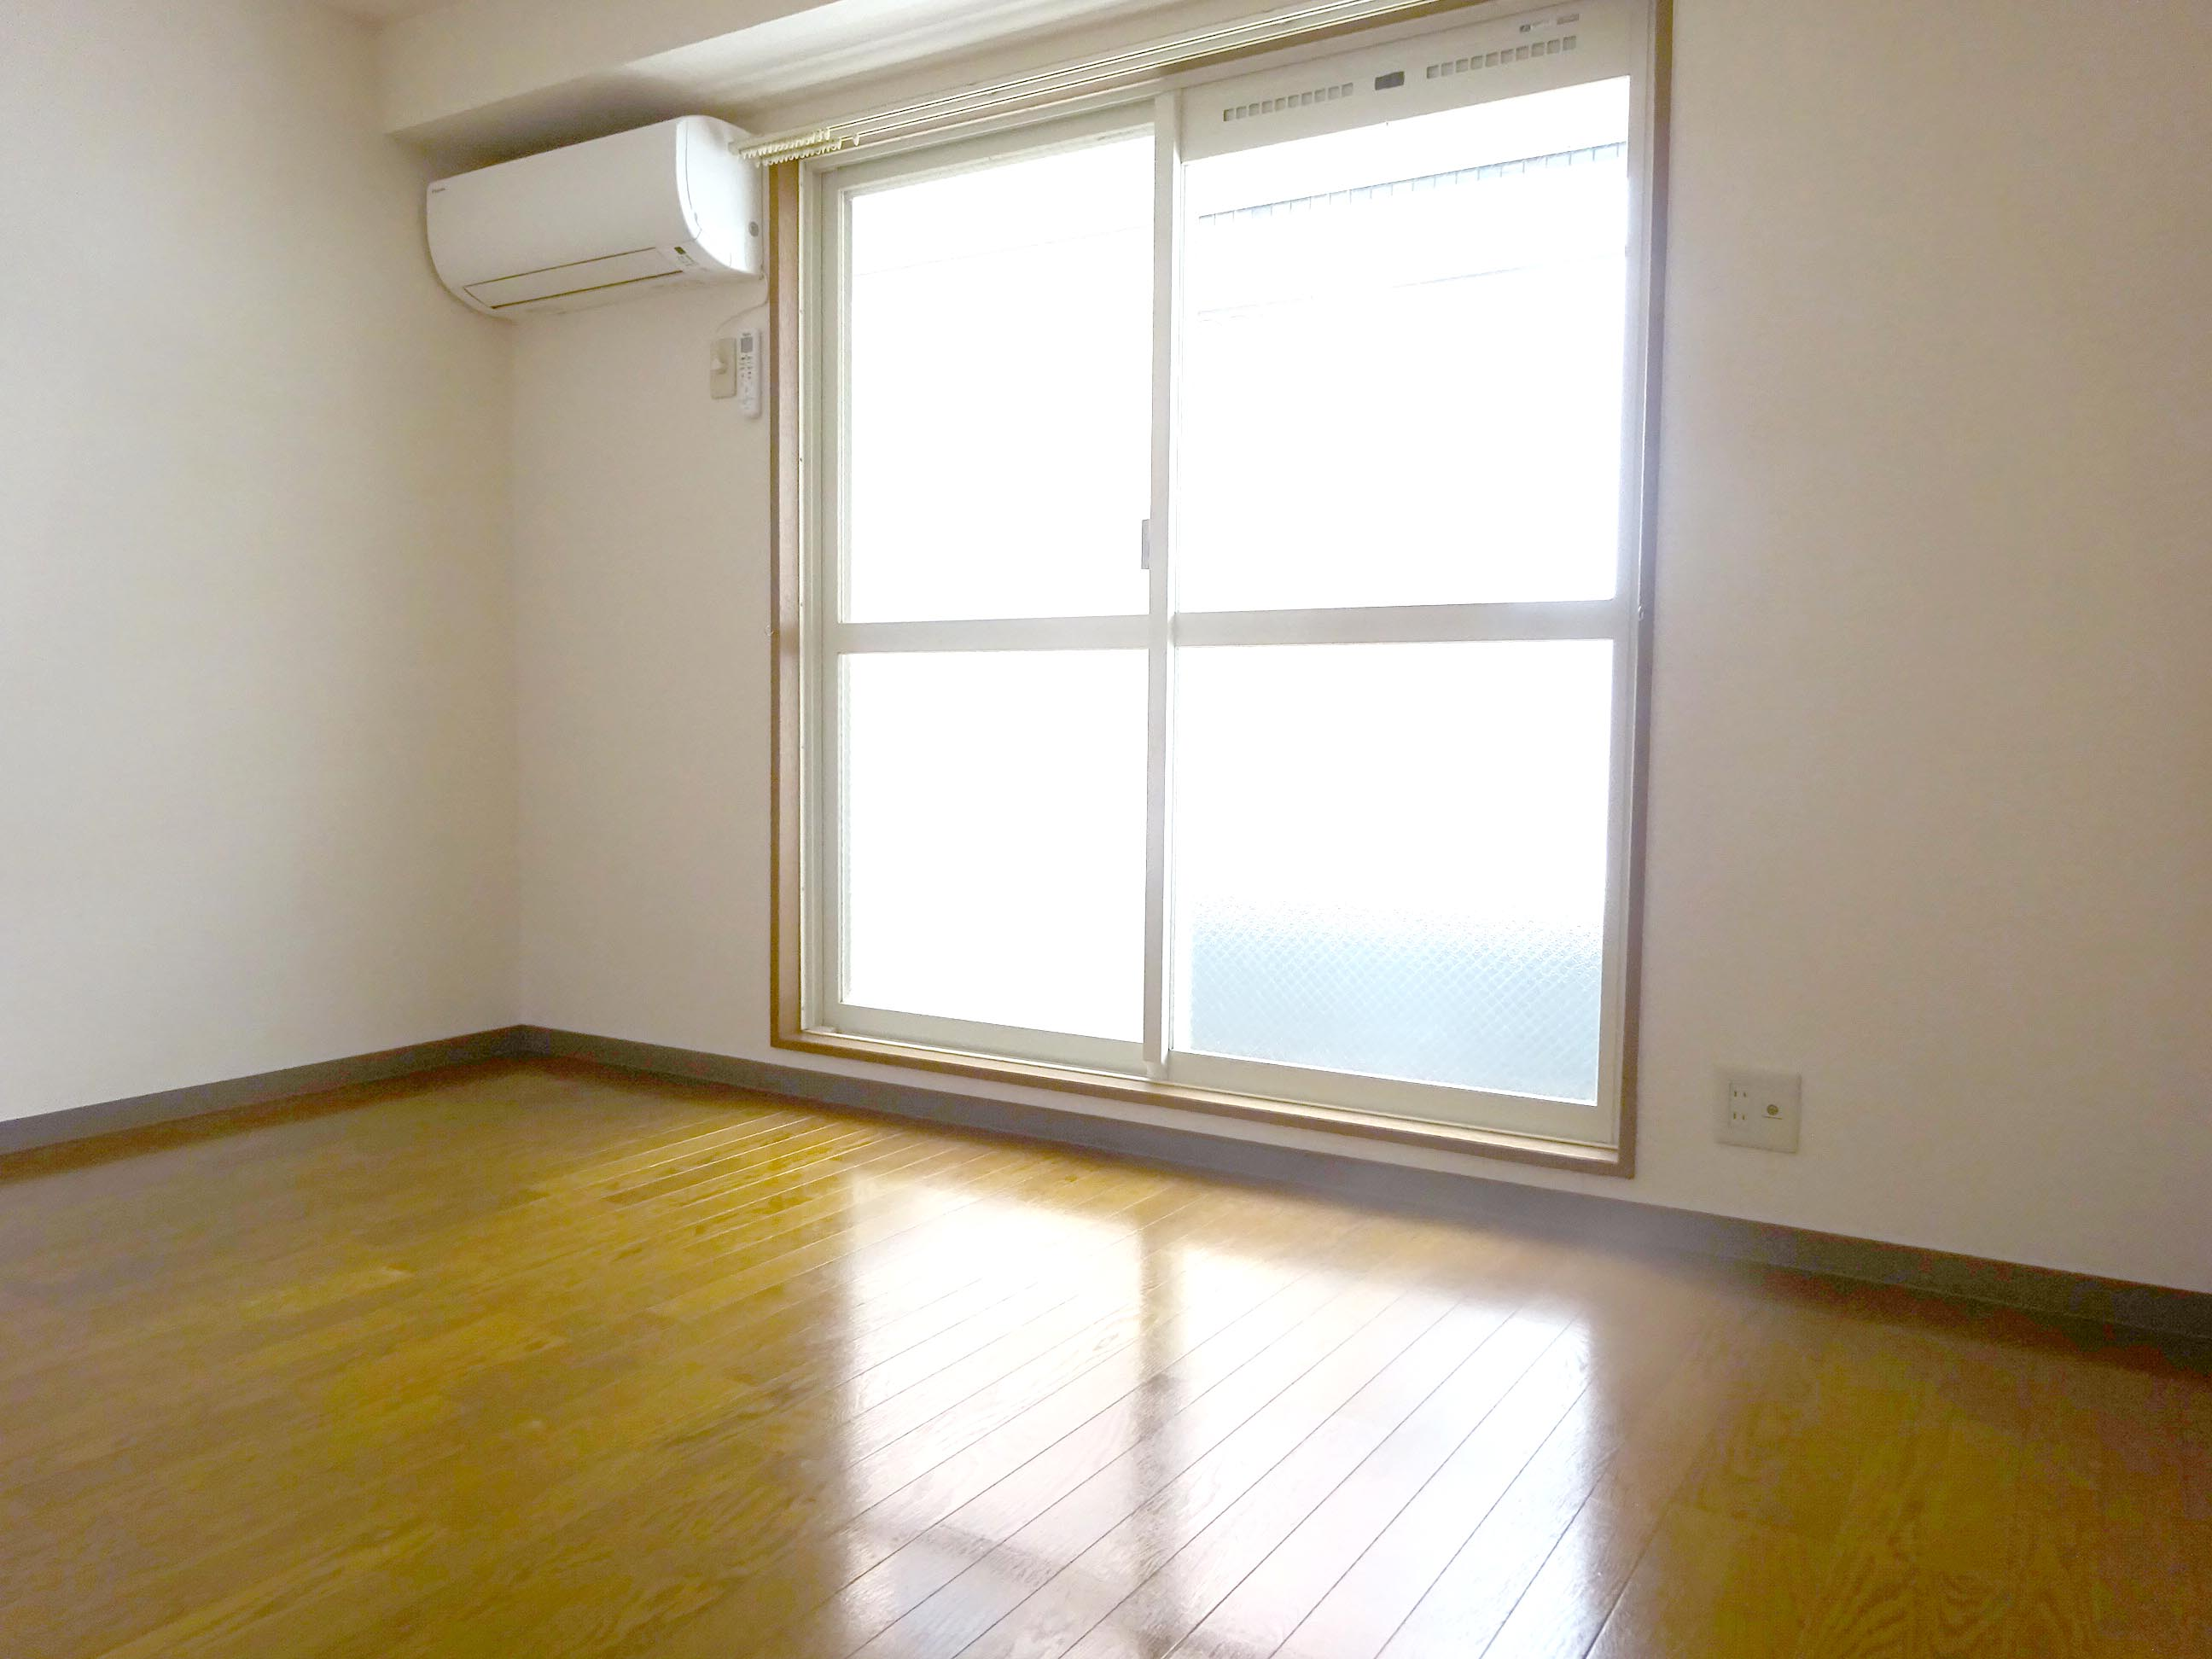 K'sマンション204号室室内